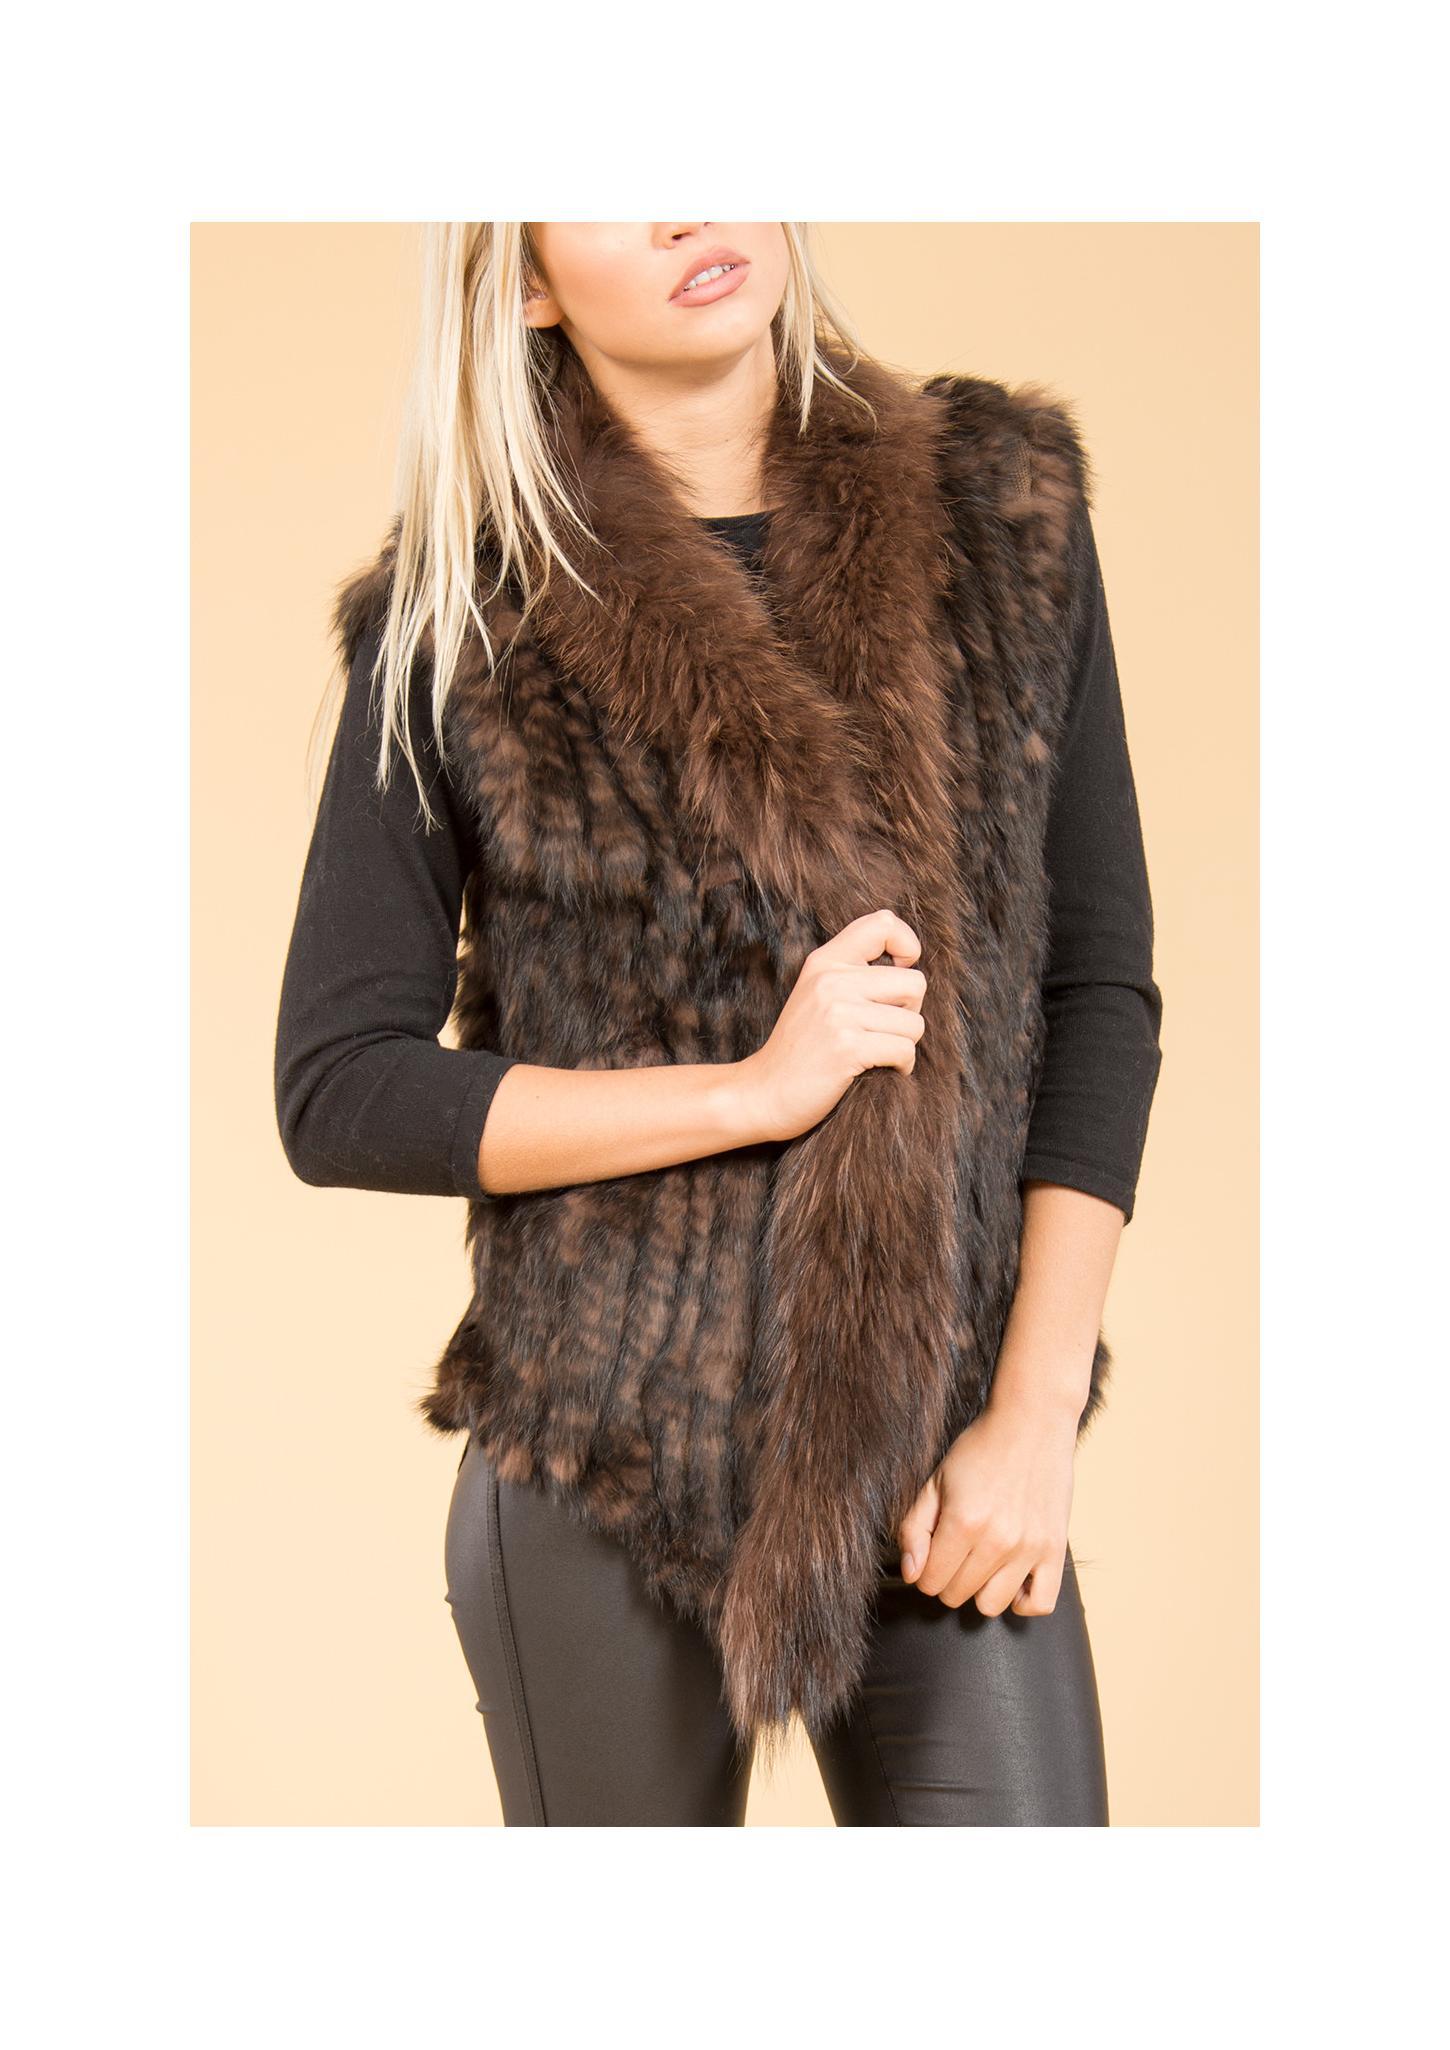 Furshouse Gilets En Vestes Femmes Fourrure qc6YBp4w7X